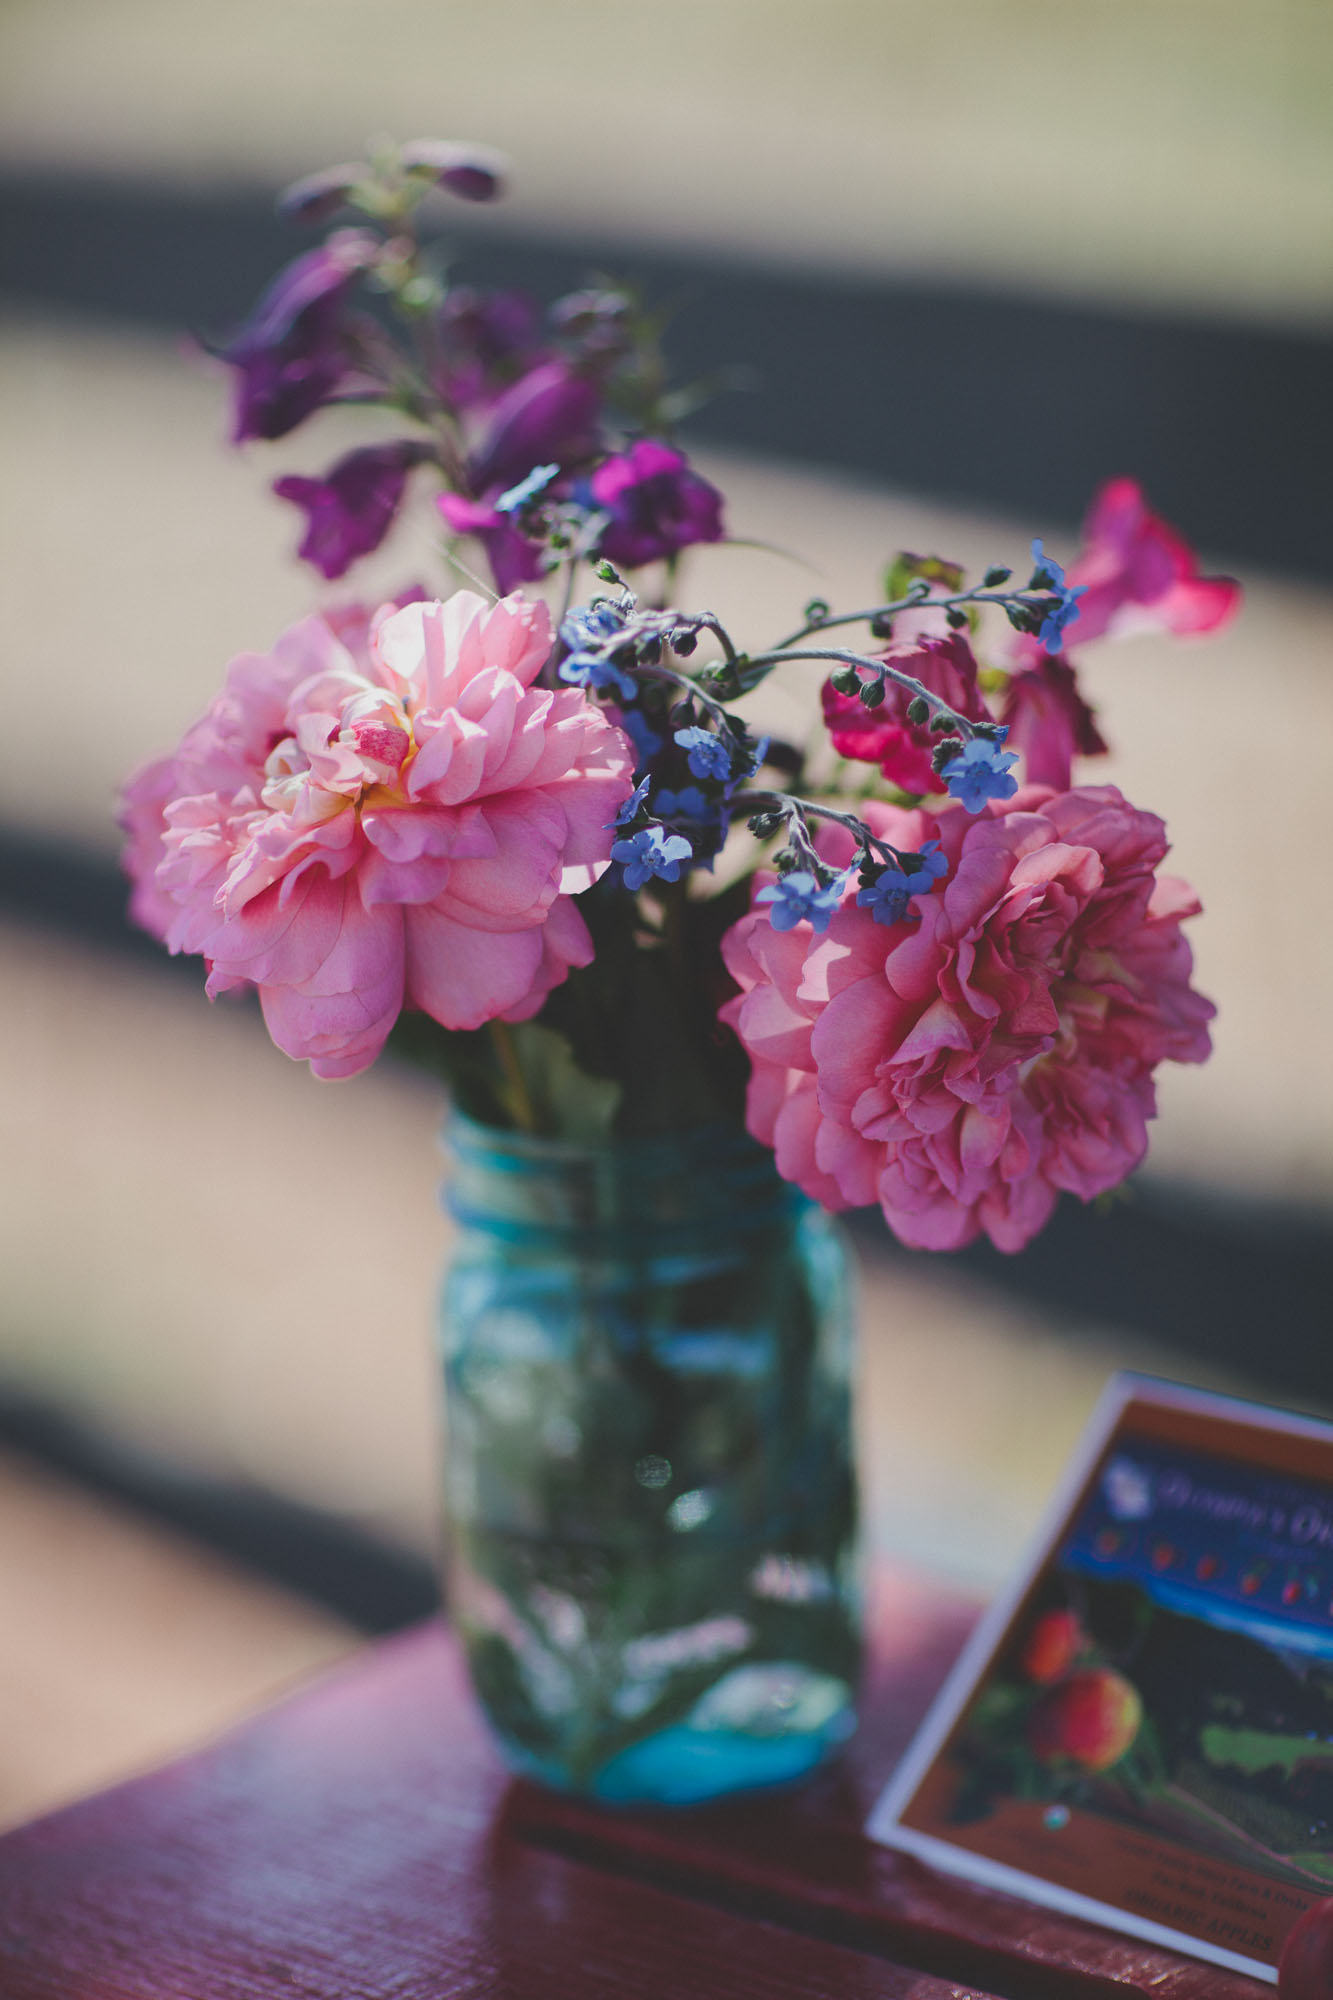 Gretchen_Gause_Petaluma_Olympias_Valley_Wedding_Photo-001.jpg